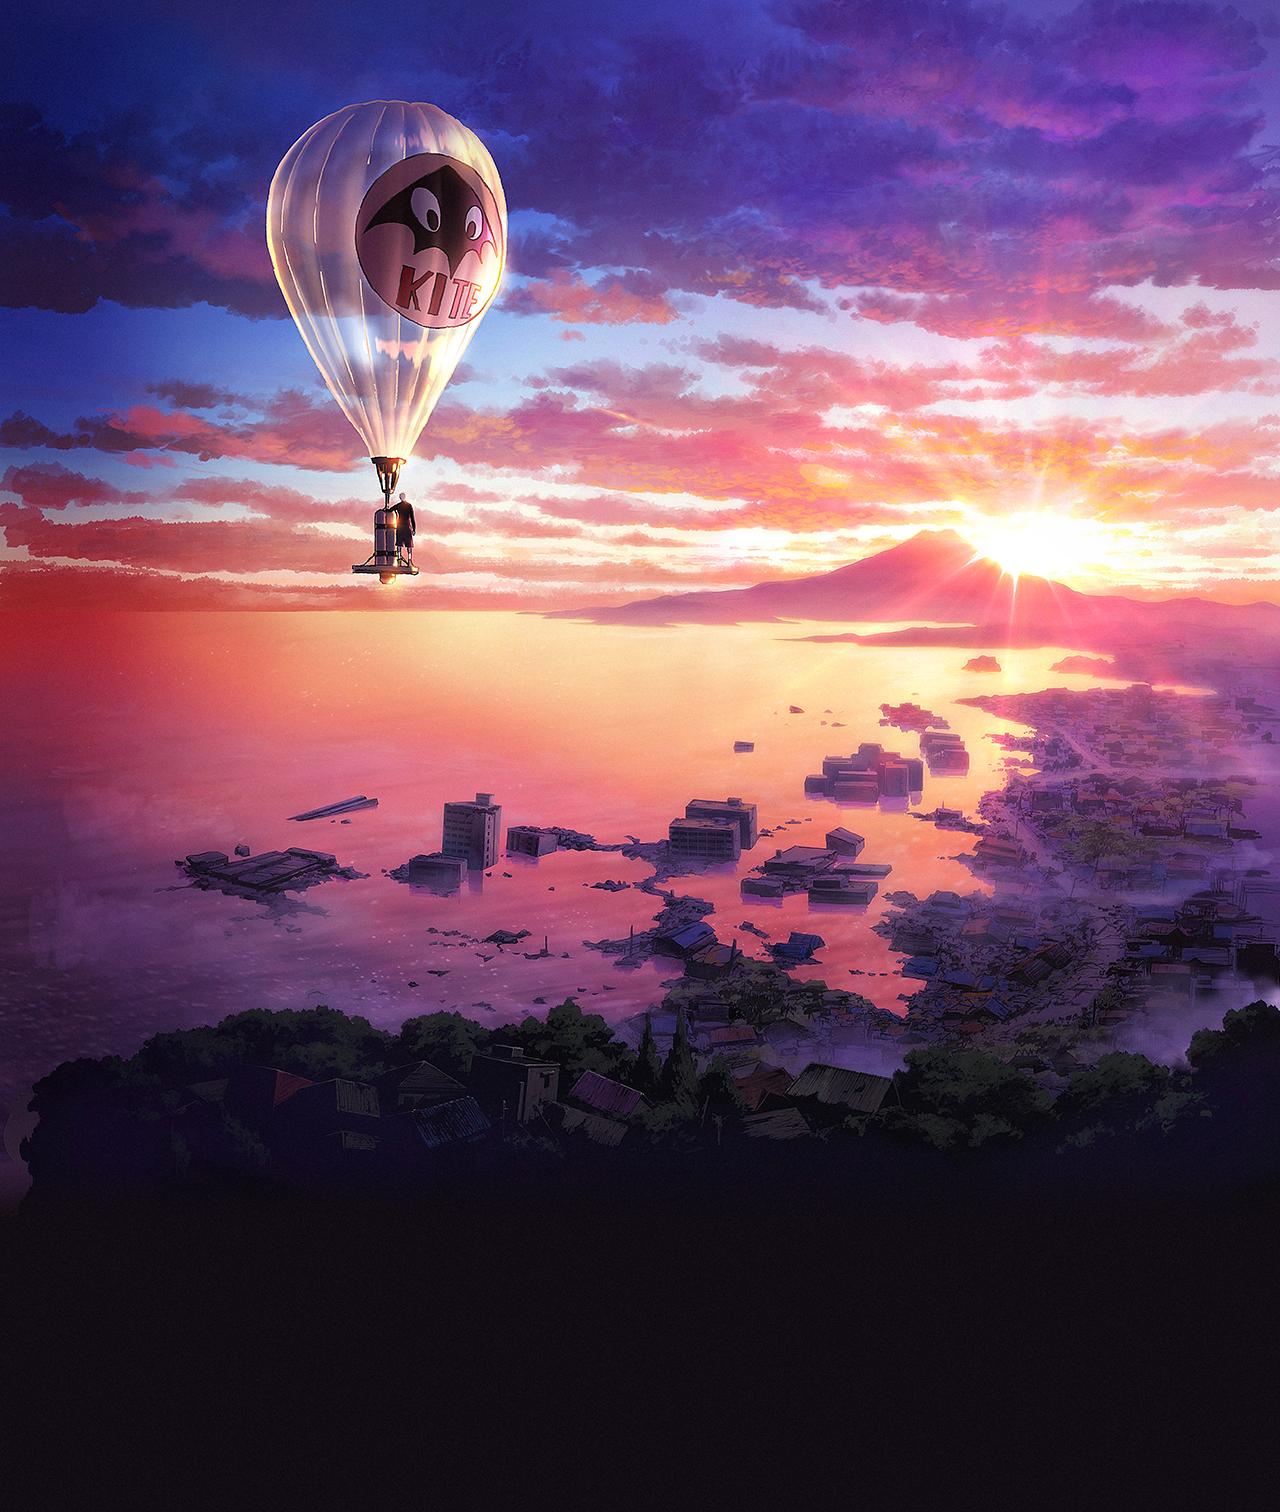 Masaaki Yuasa's 'Japan Sinks: 2020' Anime Gets Compilation Film in Japan on November 13